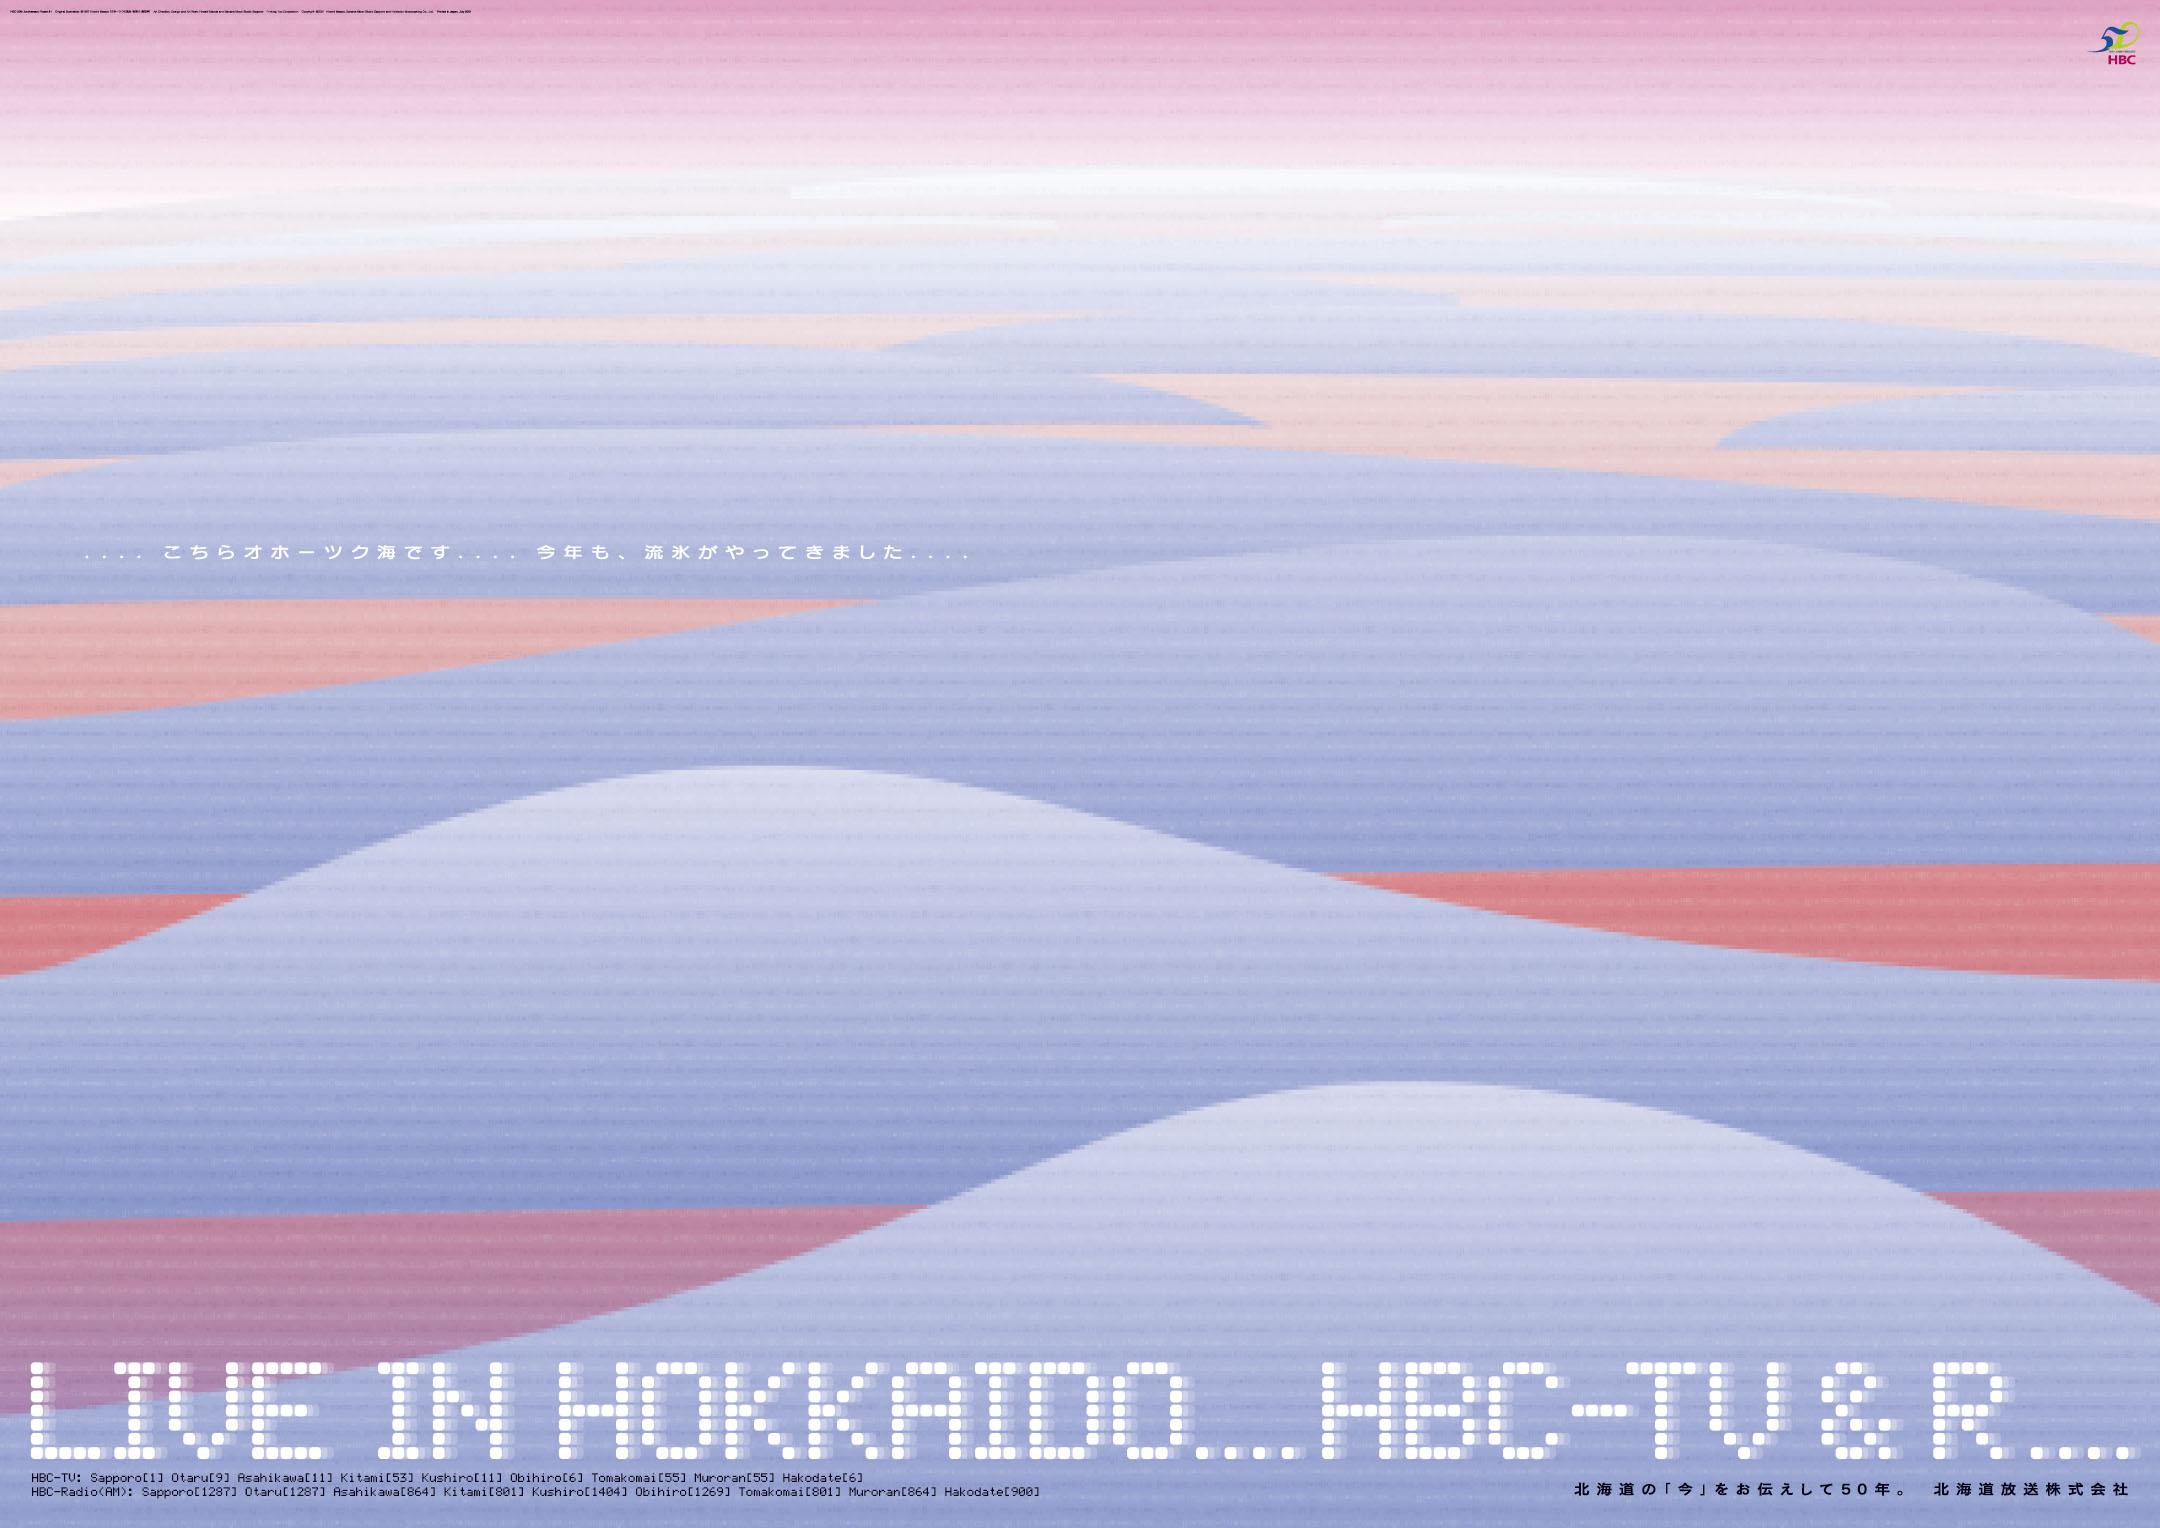 HBC TV and Radio